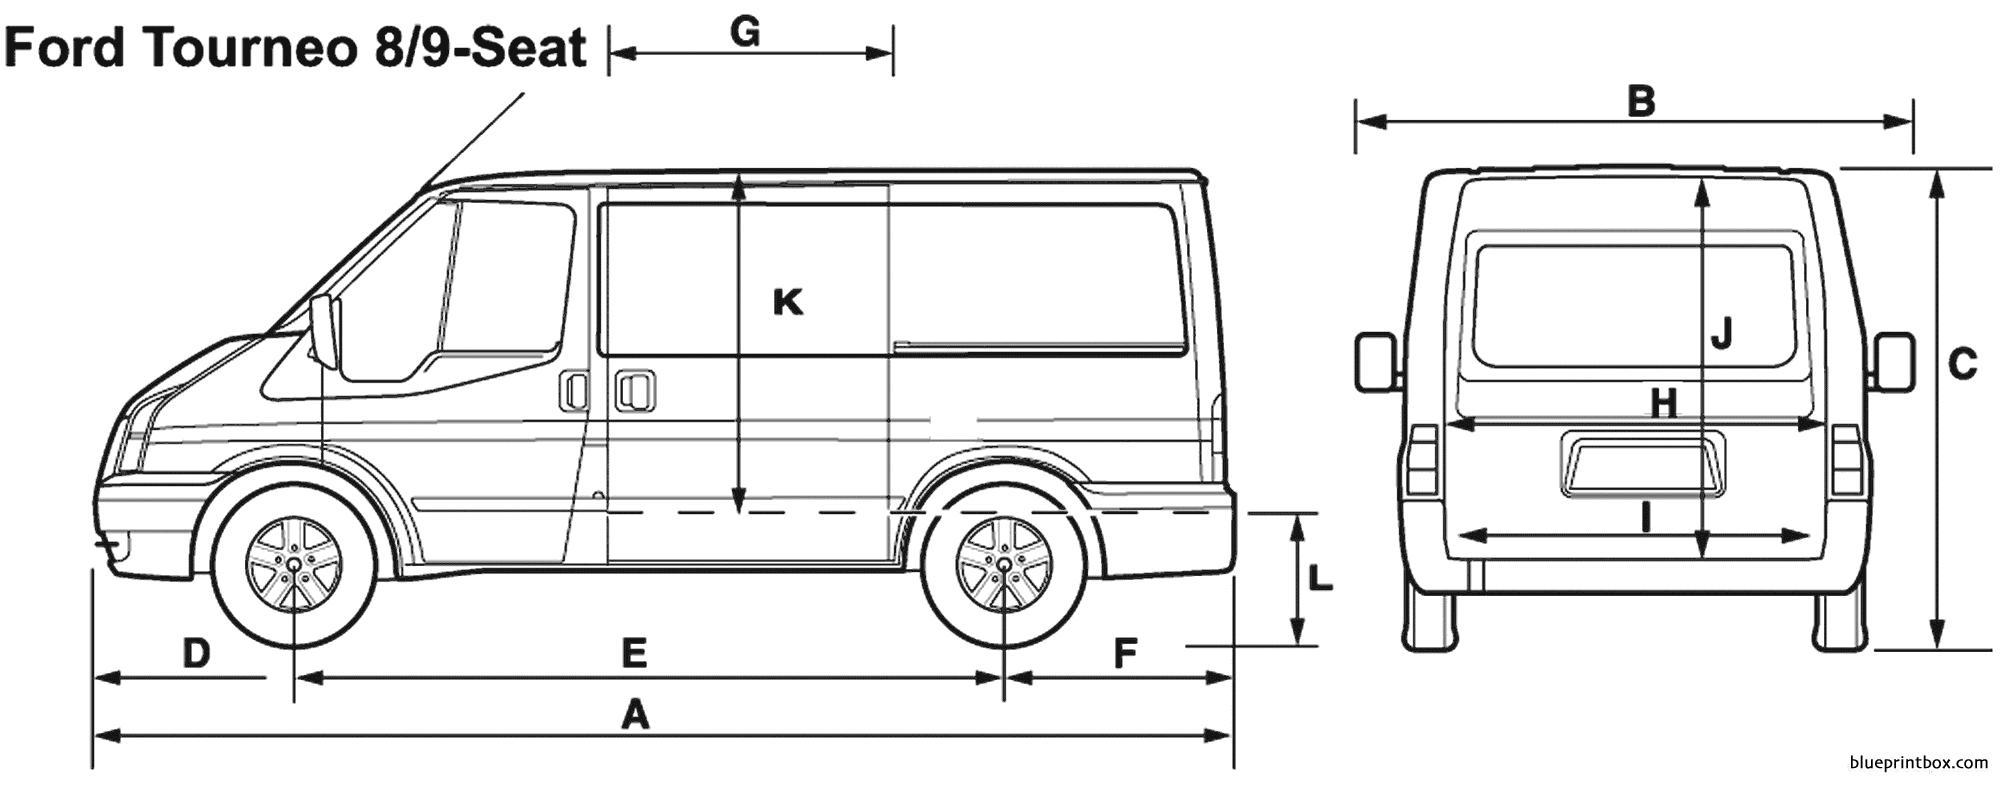 Ford Tourneo 8 Seat